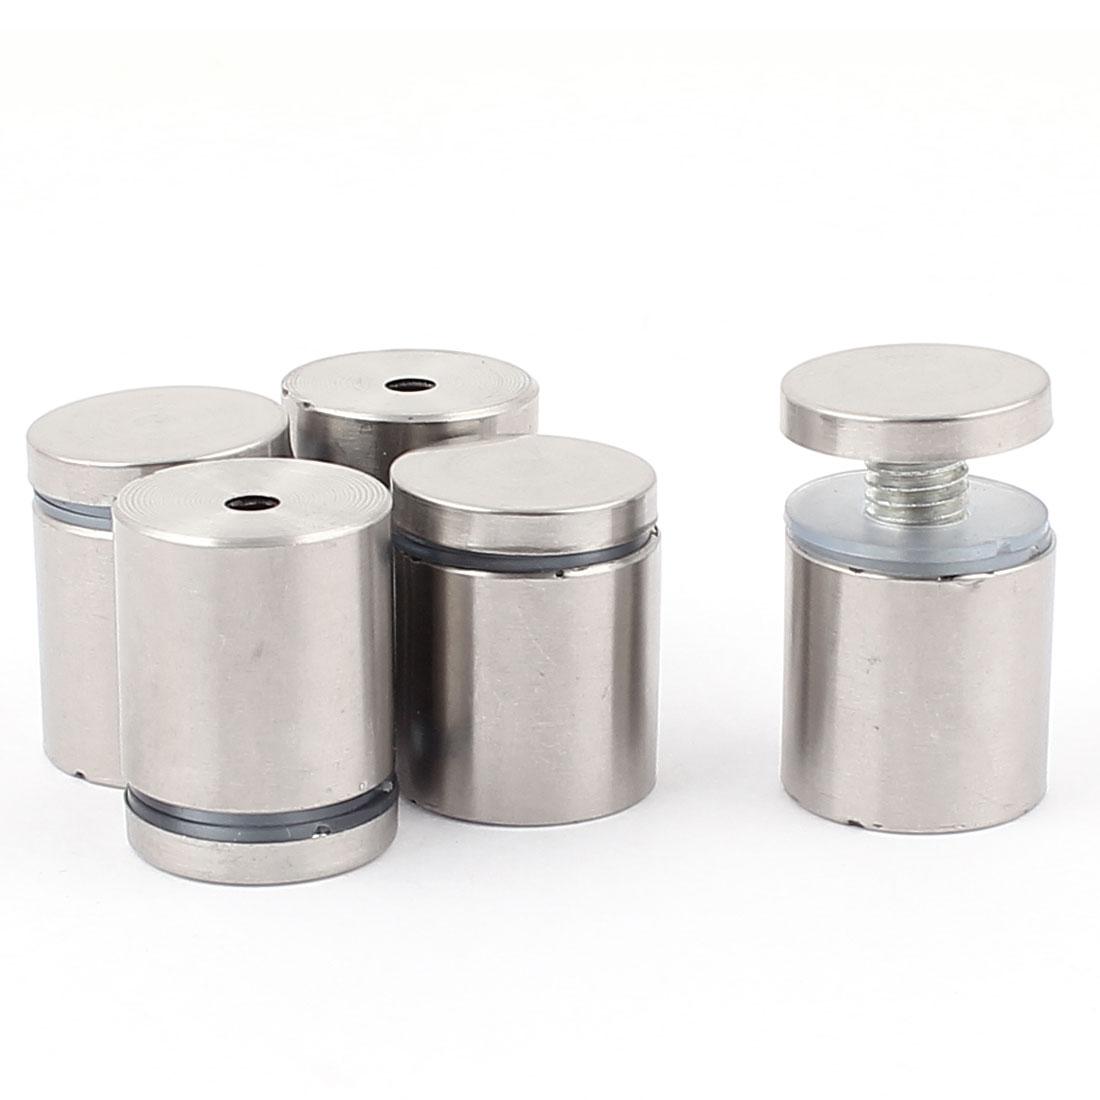 25mm x 32mm Stainless Steel Advertising Frameless Glass Standoff Pins 5pcs